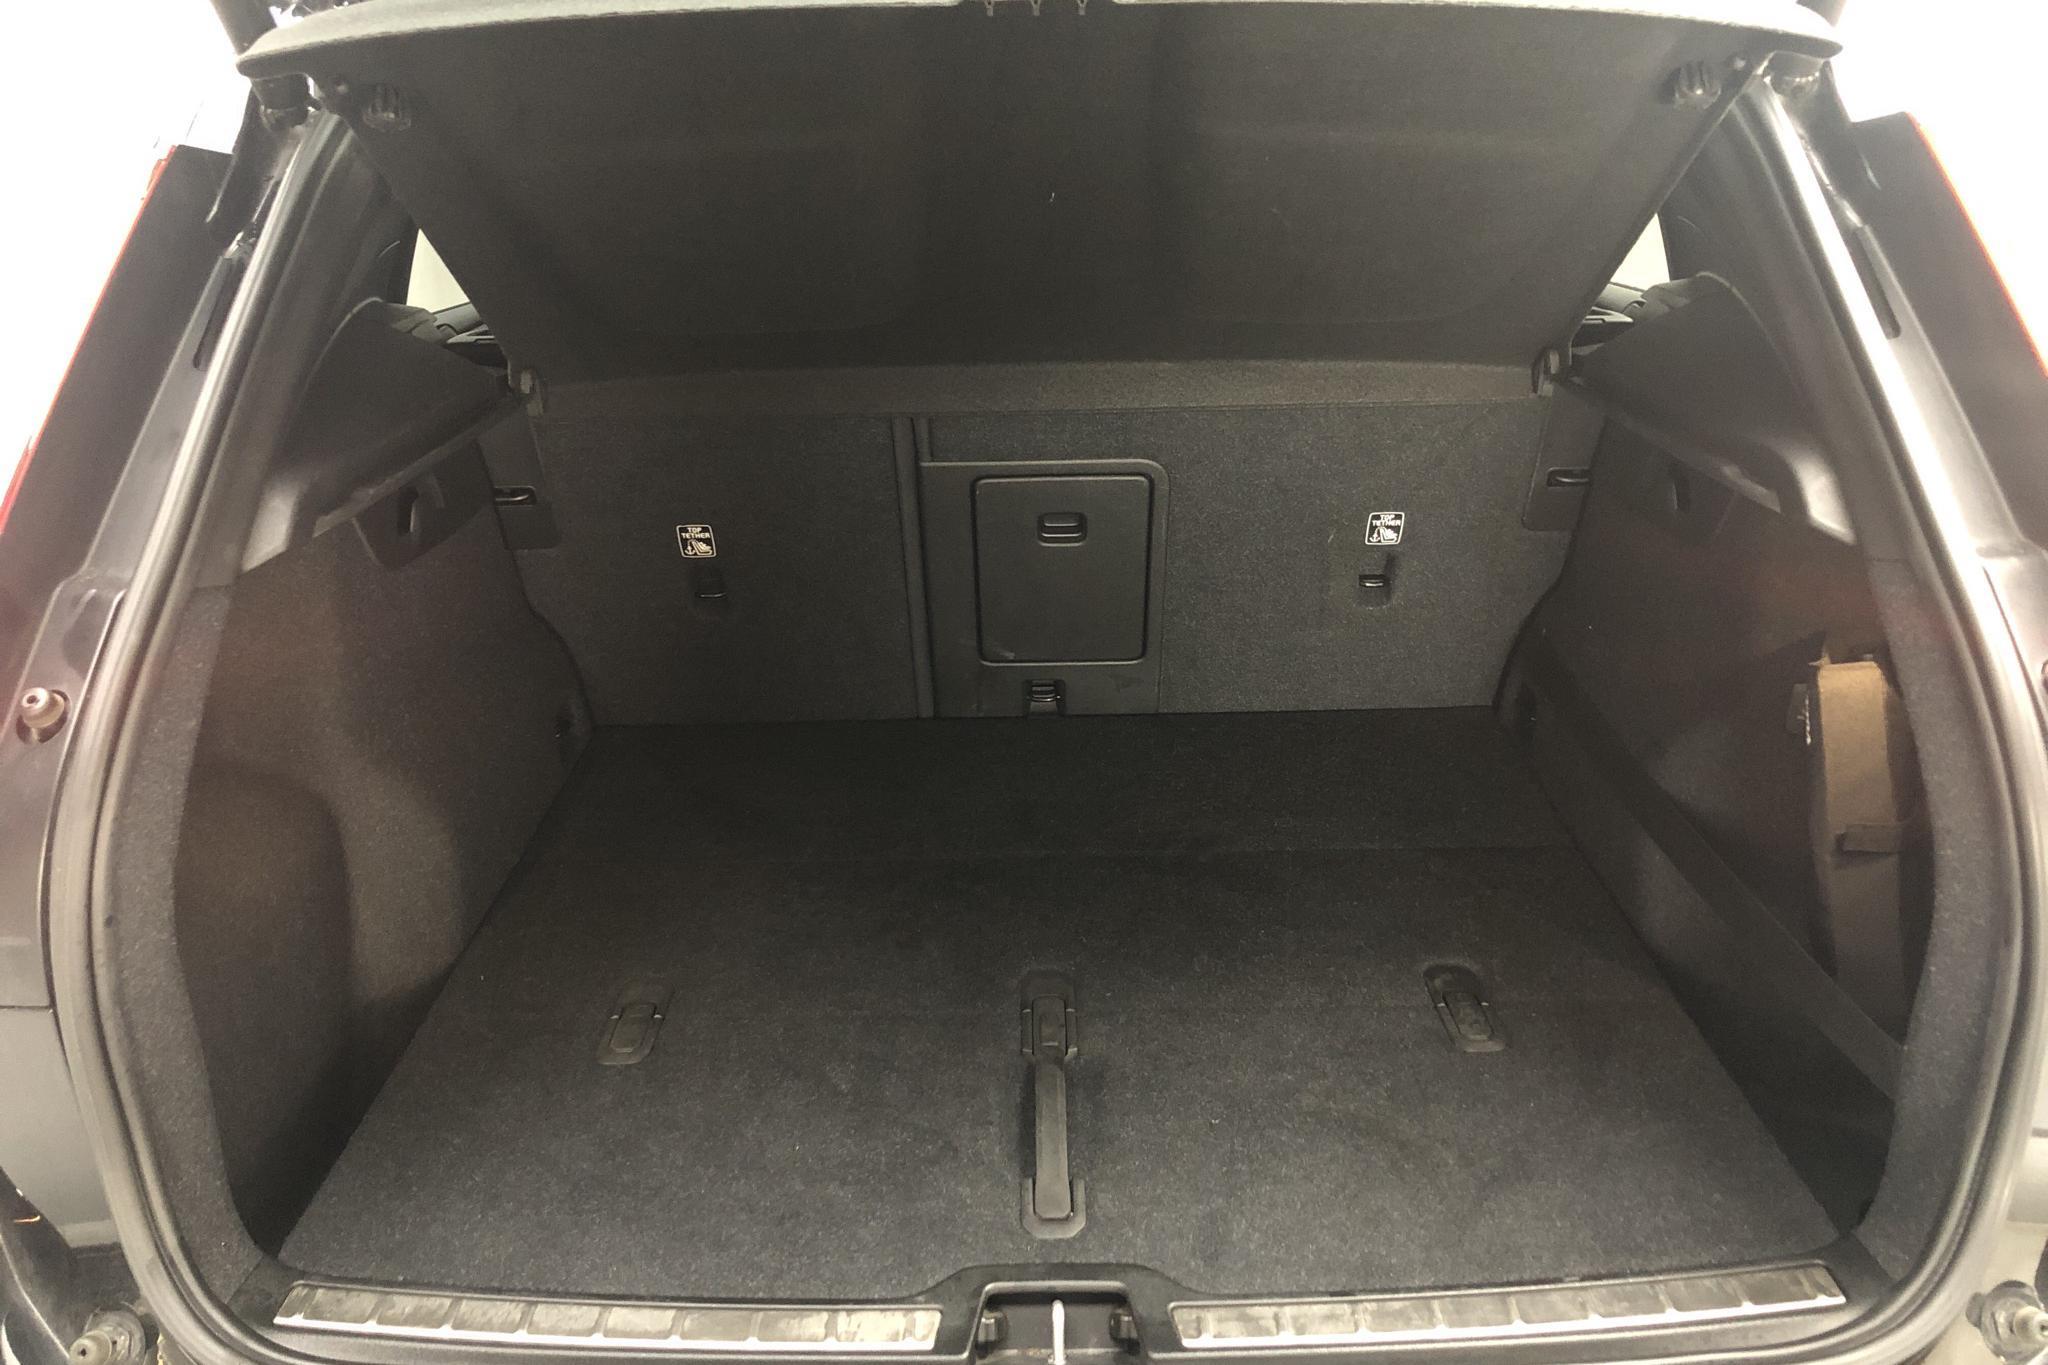 Volvo XC40 D4 AWD (190hk) - 47 380 km - Automatic - black - 2020